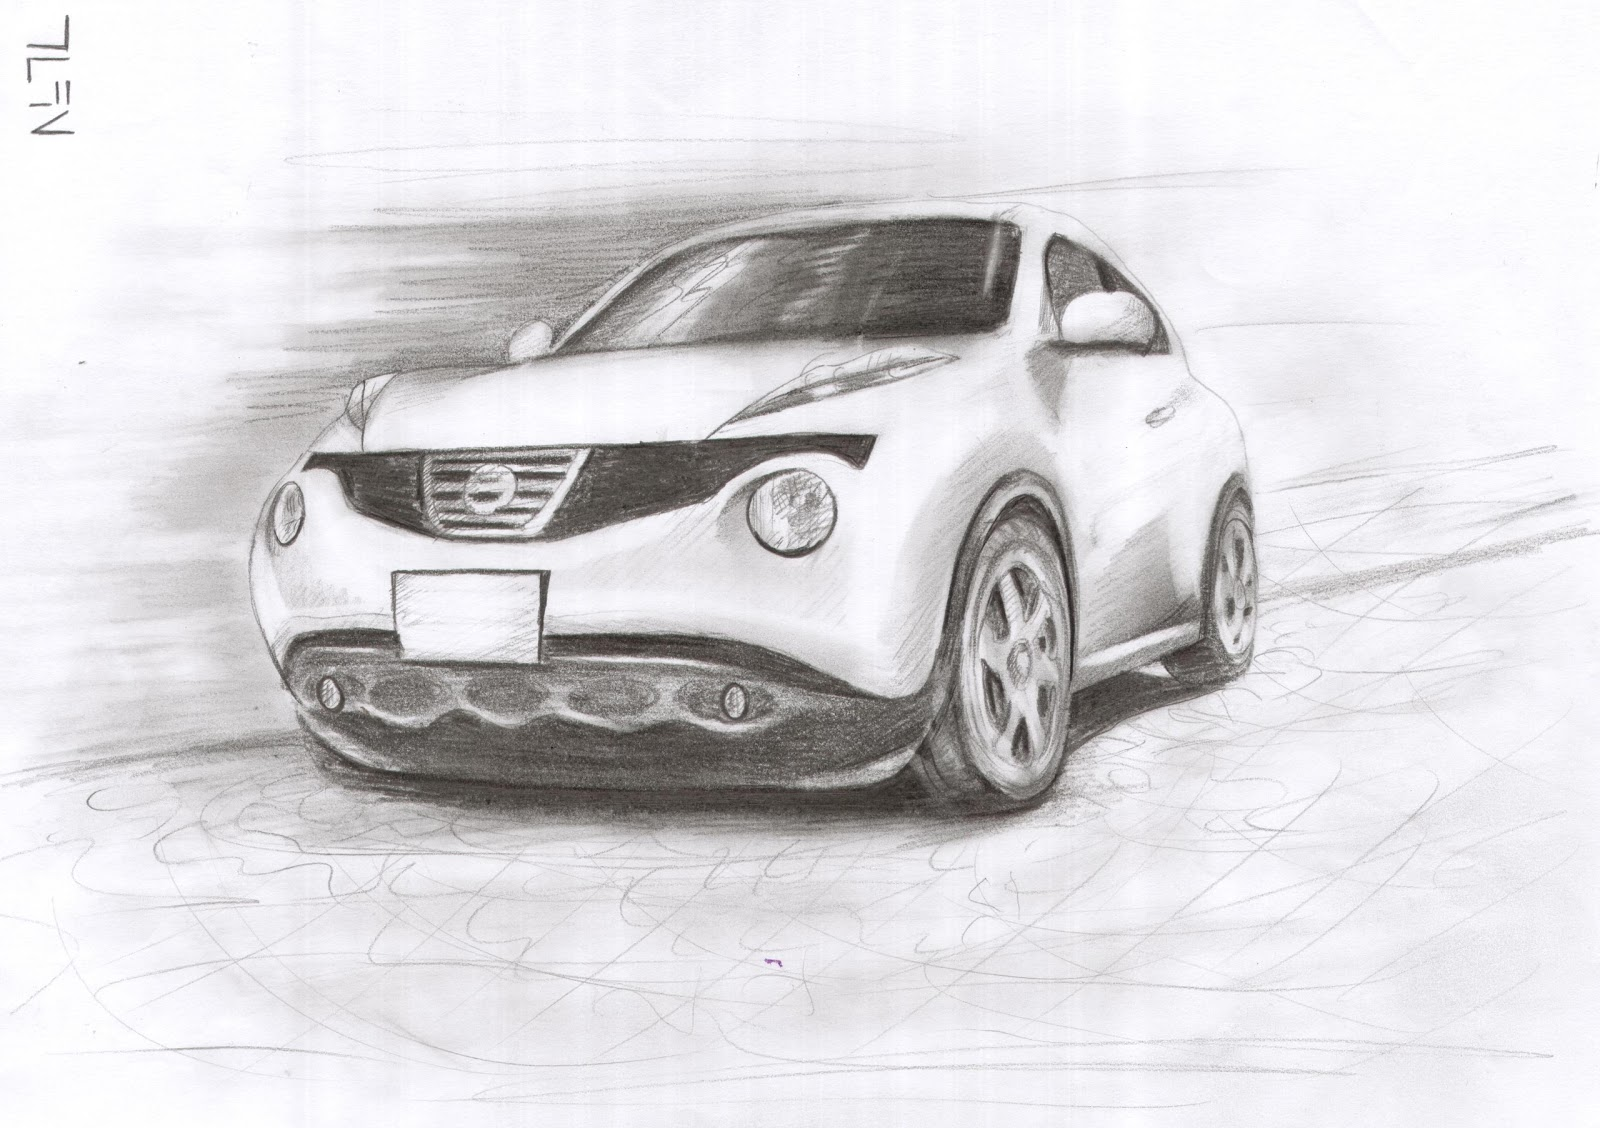 Nissan Juke Drawing with Charcoal by Tufan Demirkır - Garage Car